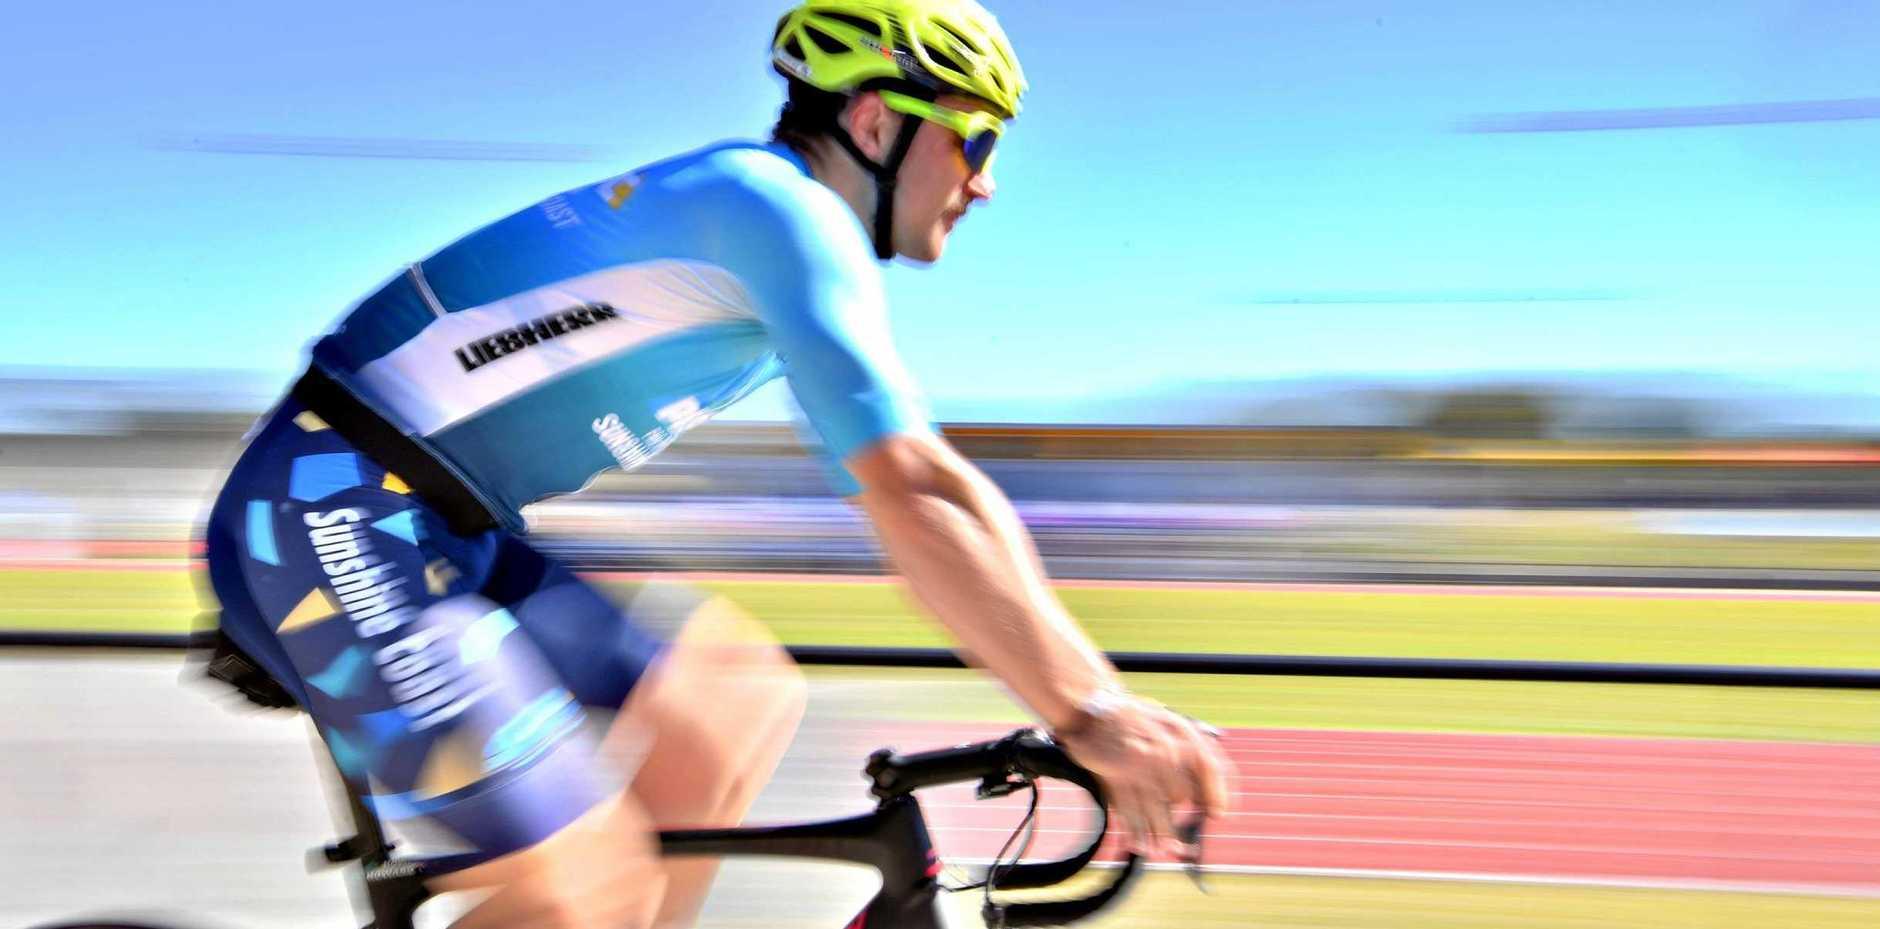 Pro Racing Sunshine Coast cyclist Leigh Howard at University of the Sunshine Coast.